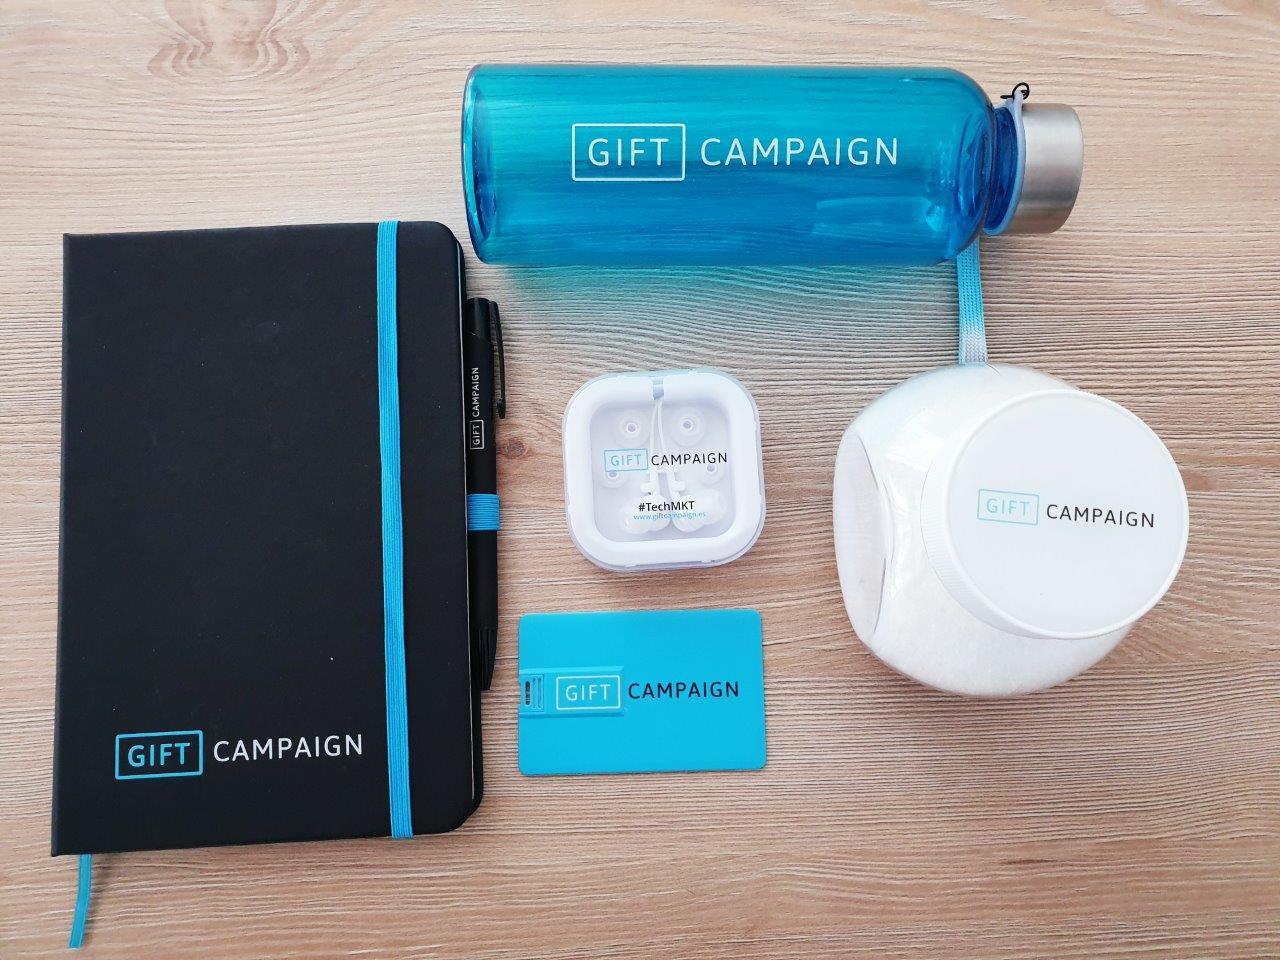 gift-campaign-merchandising (2)